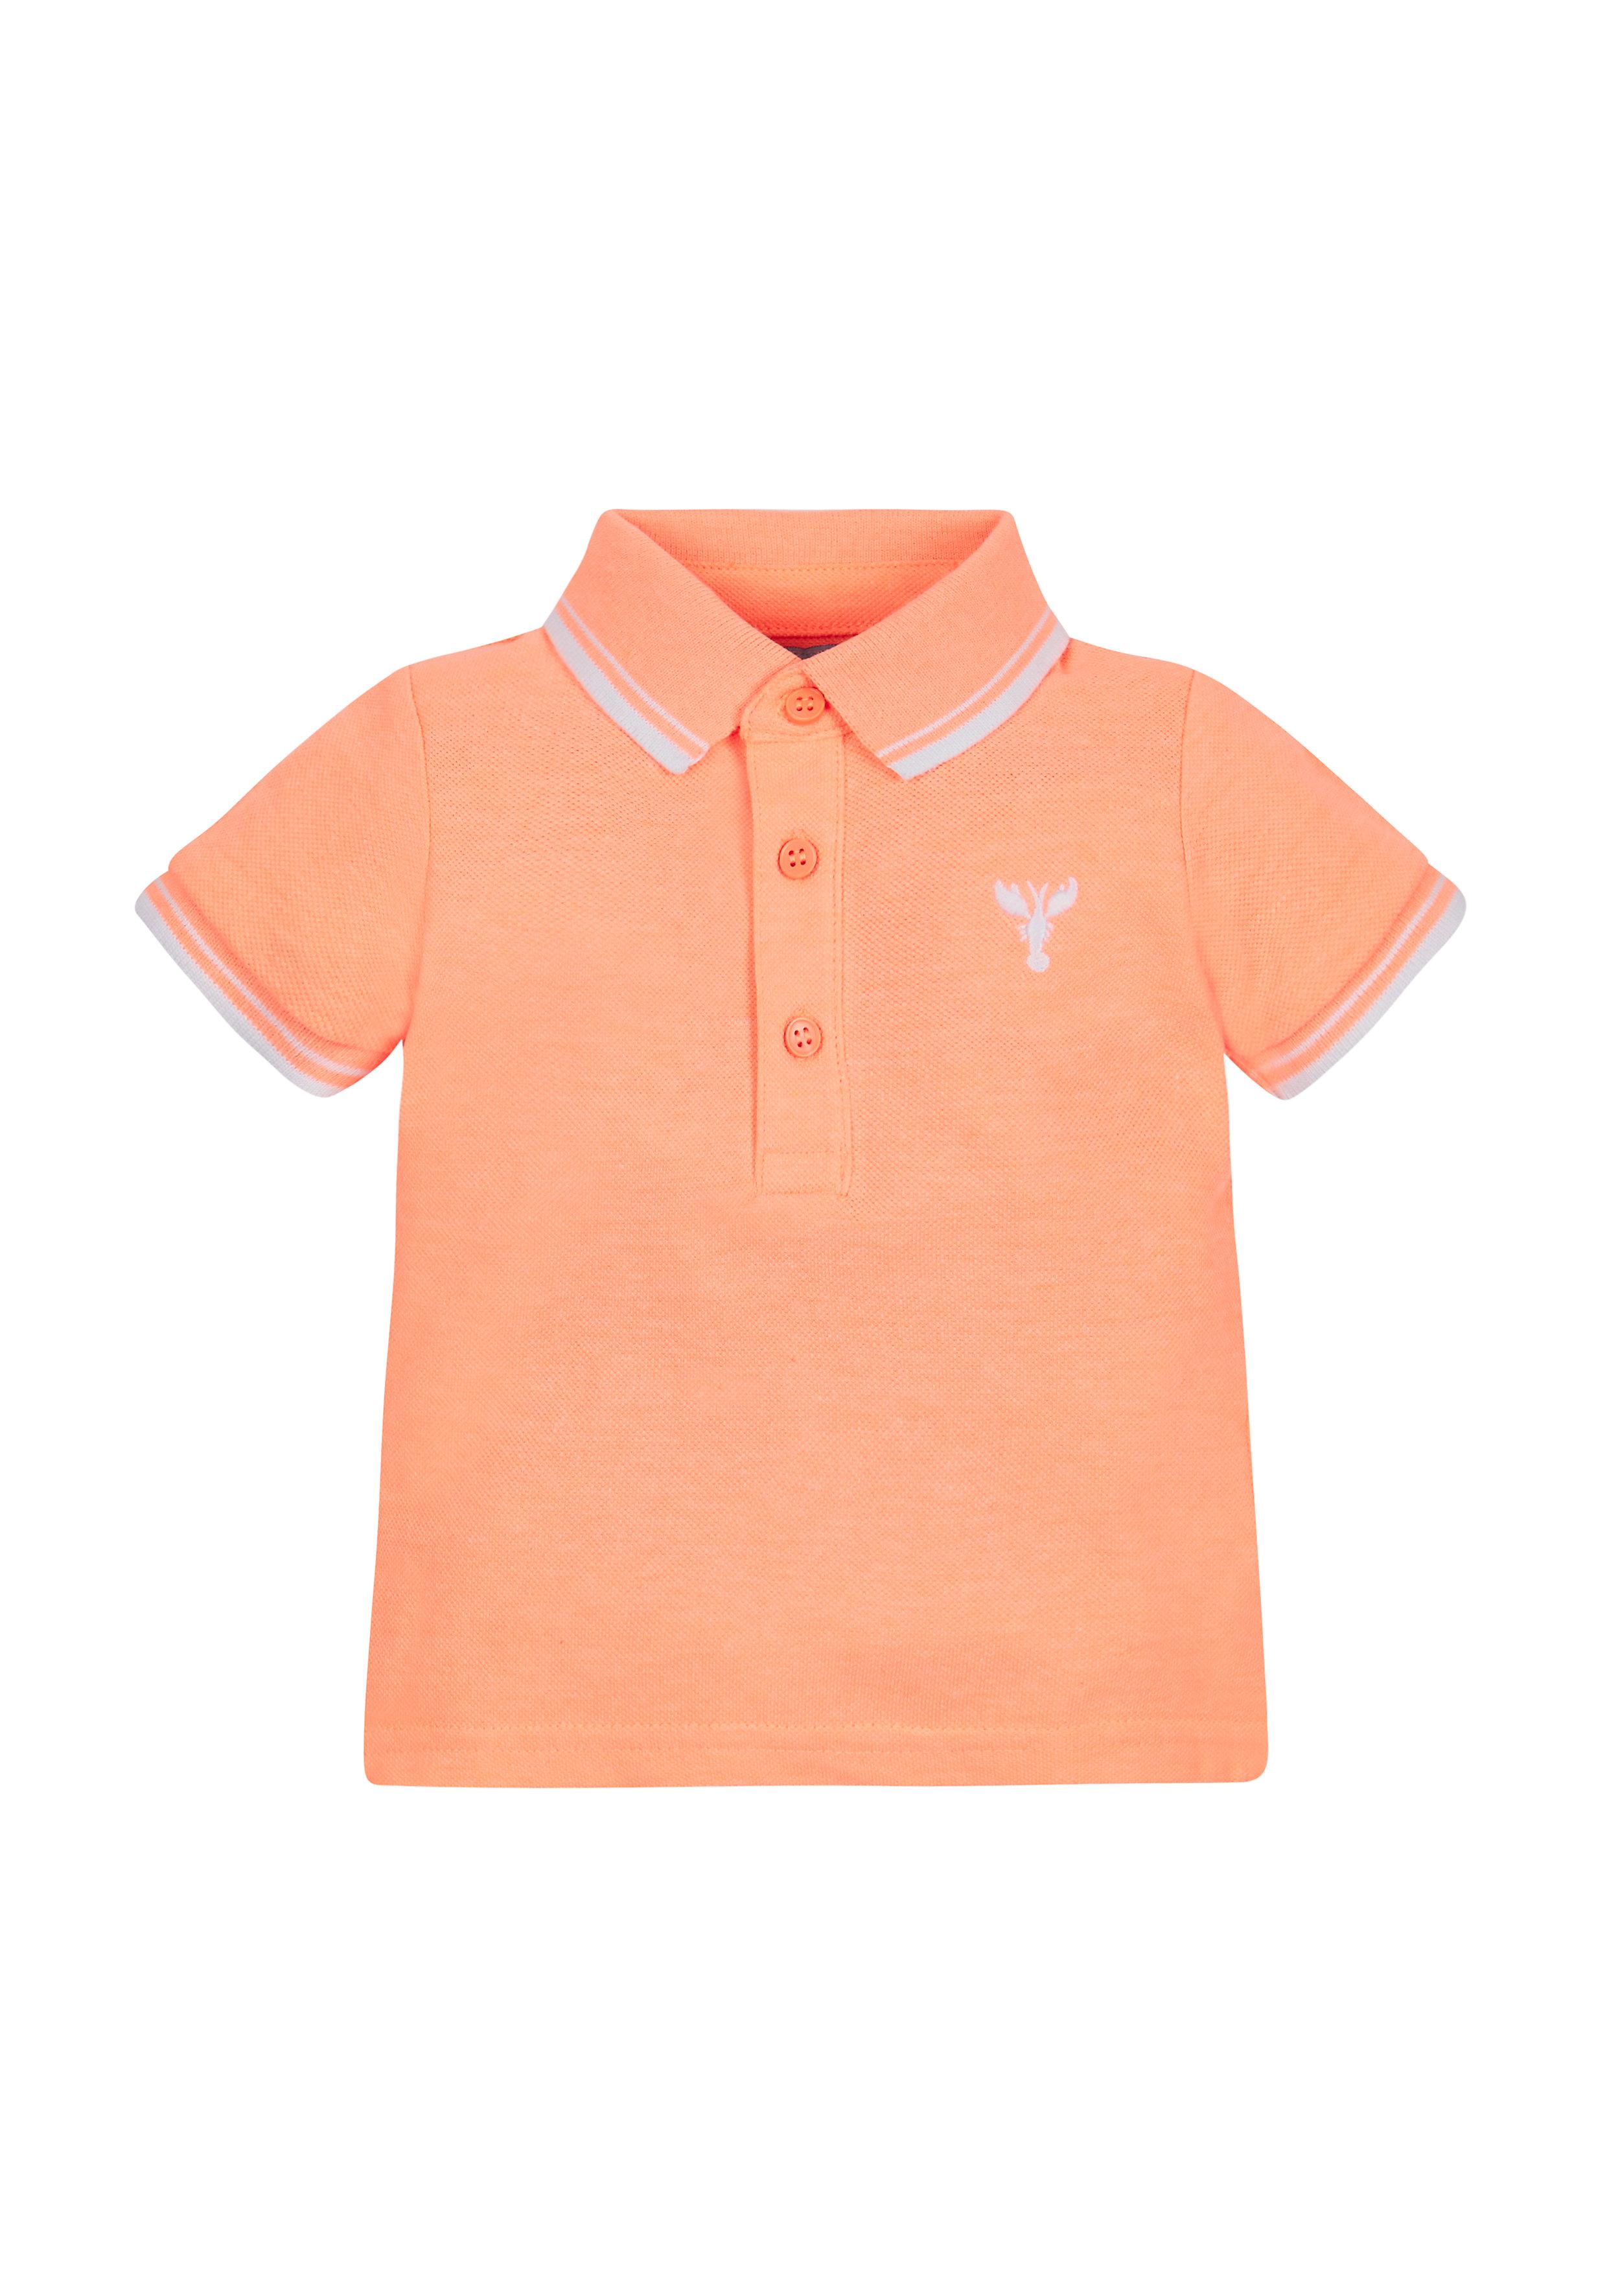 Mothercare | Boys Half Sleeves Embroidered Polo T-Shirt - Orange